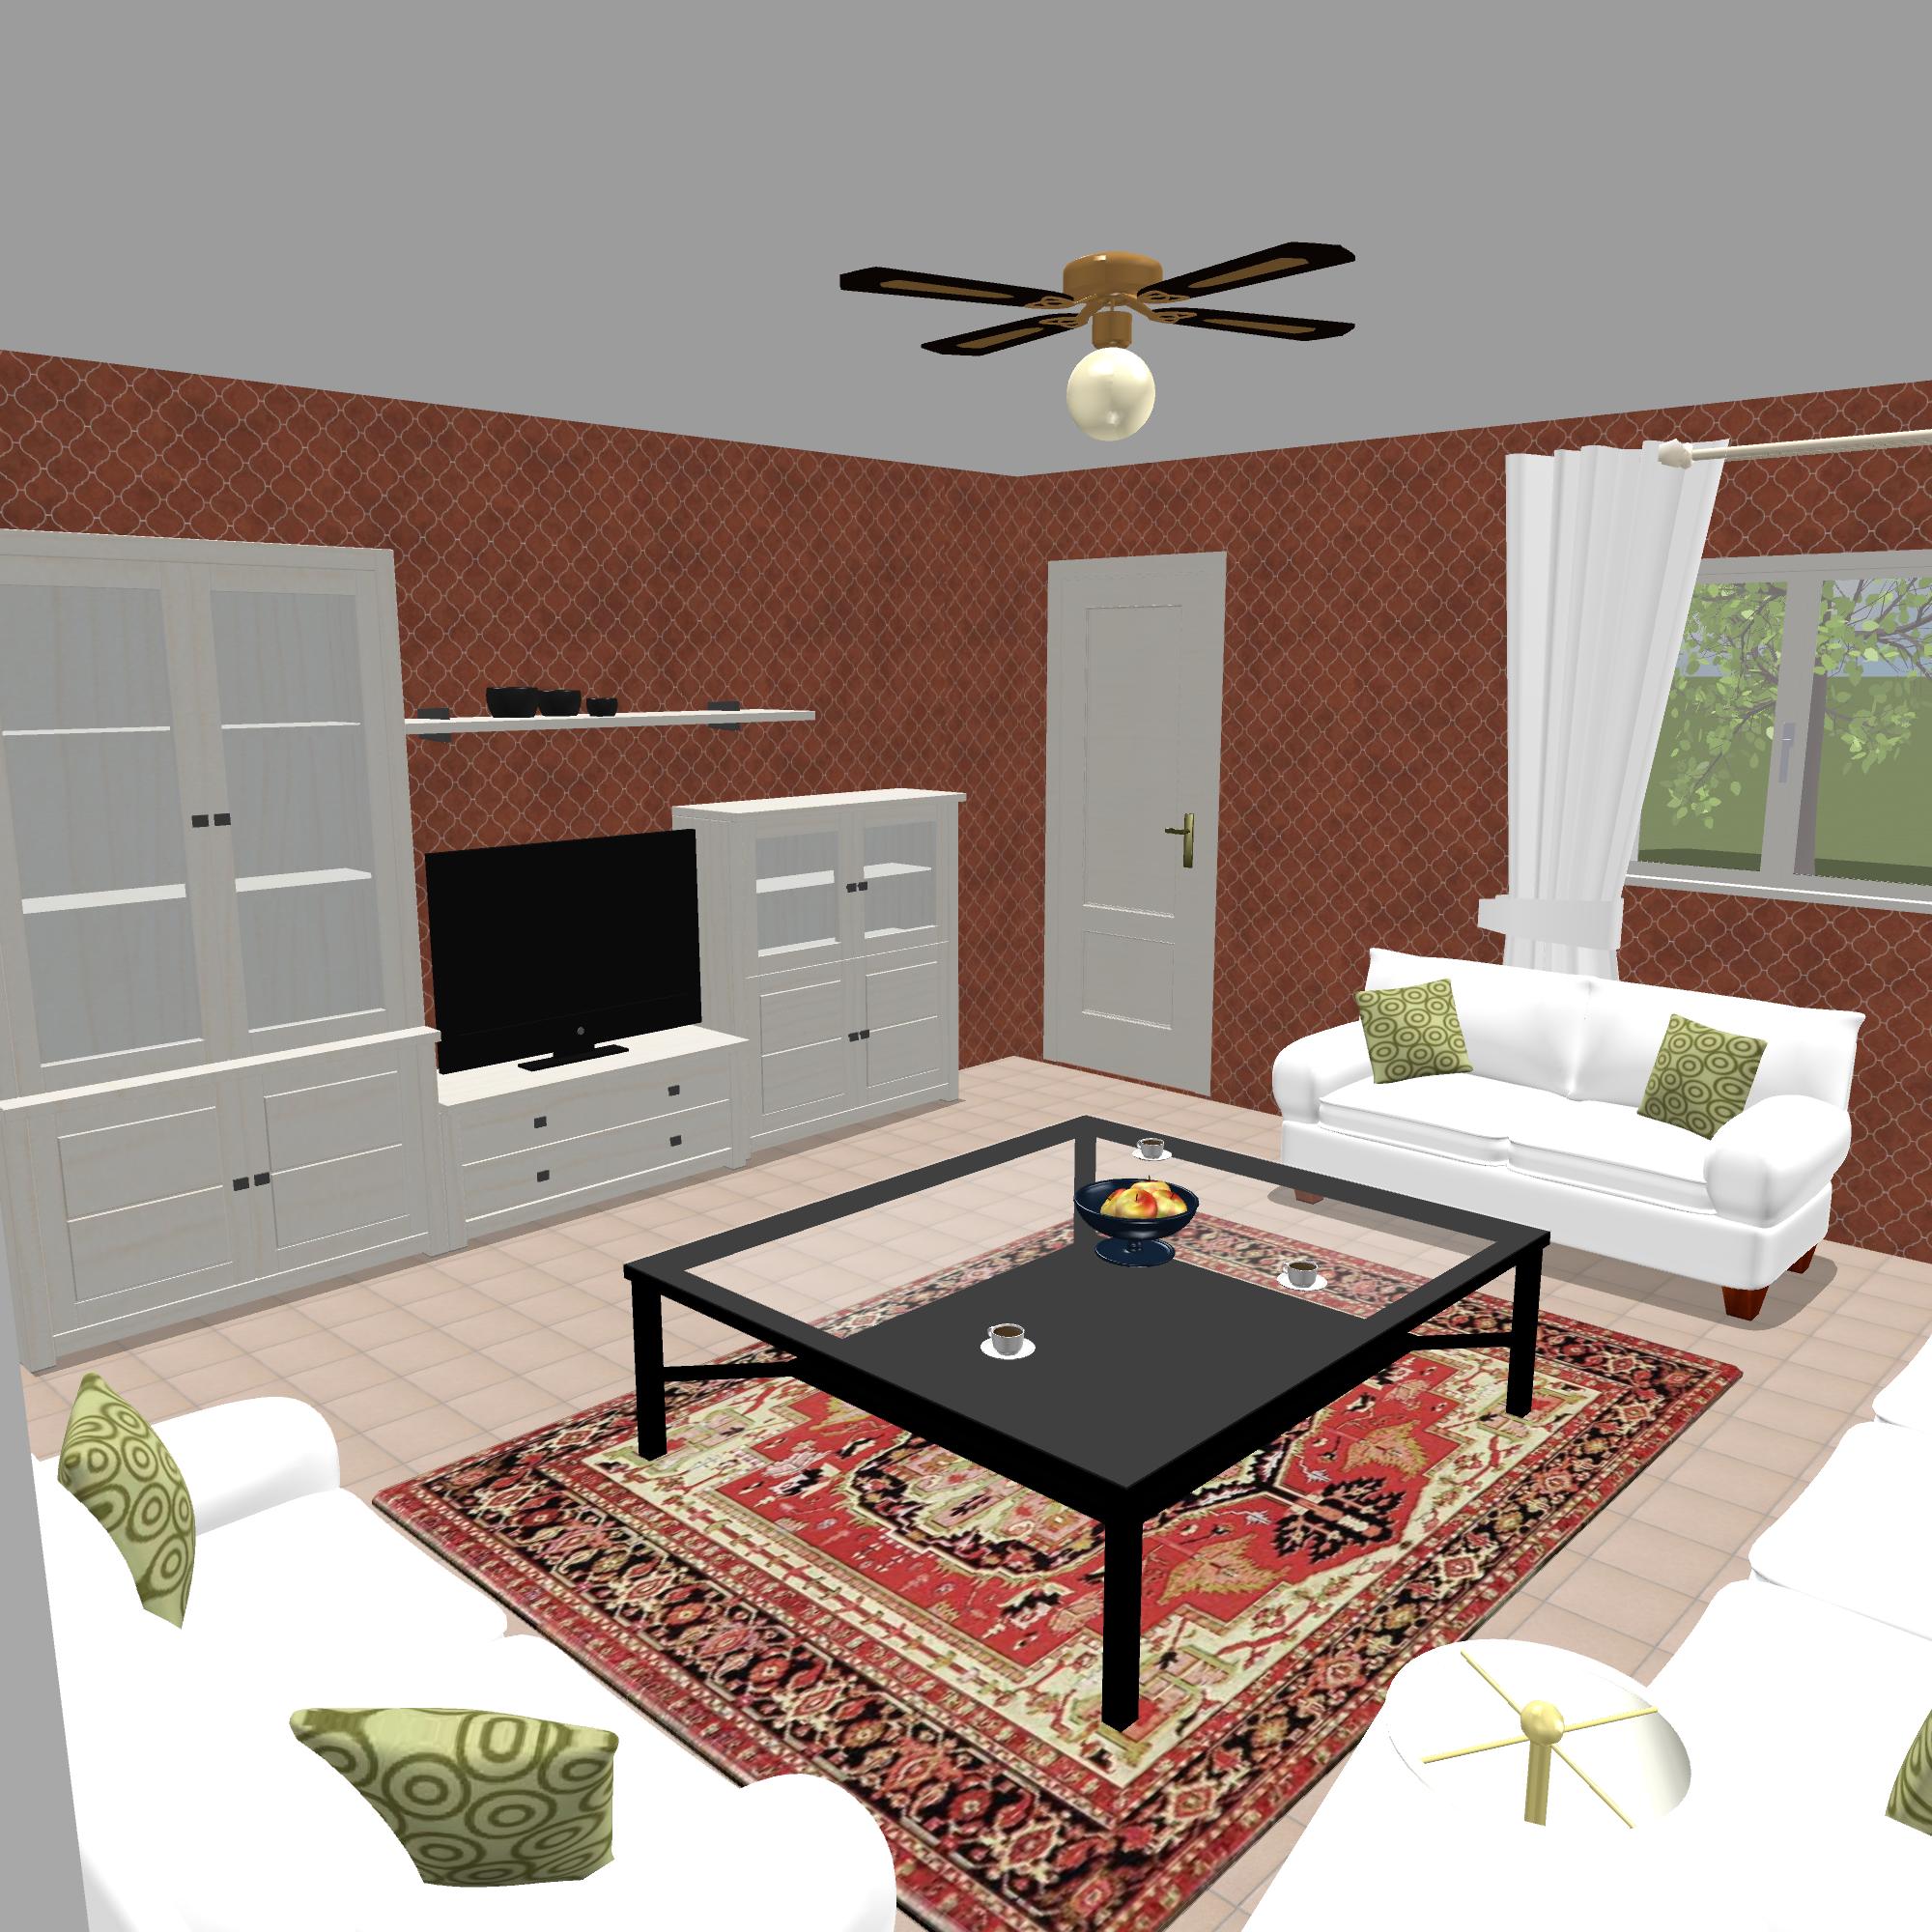 130sqm_living room.png